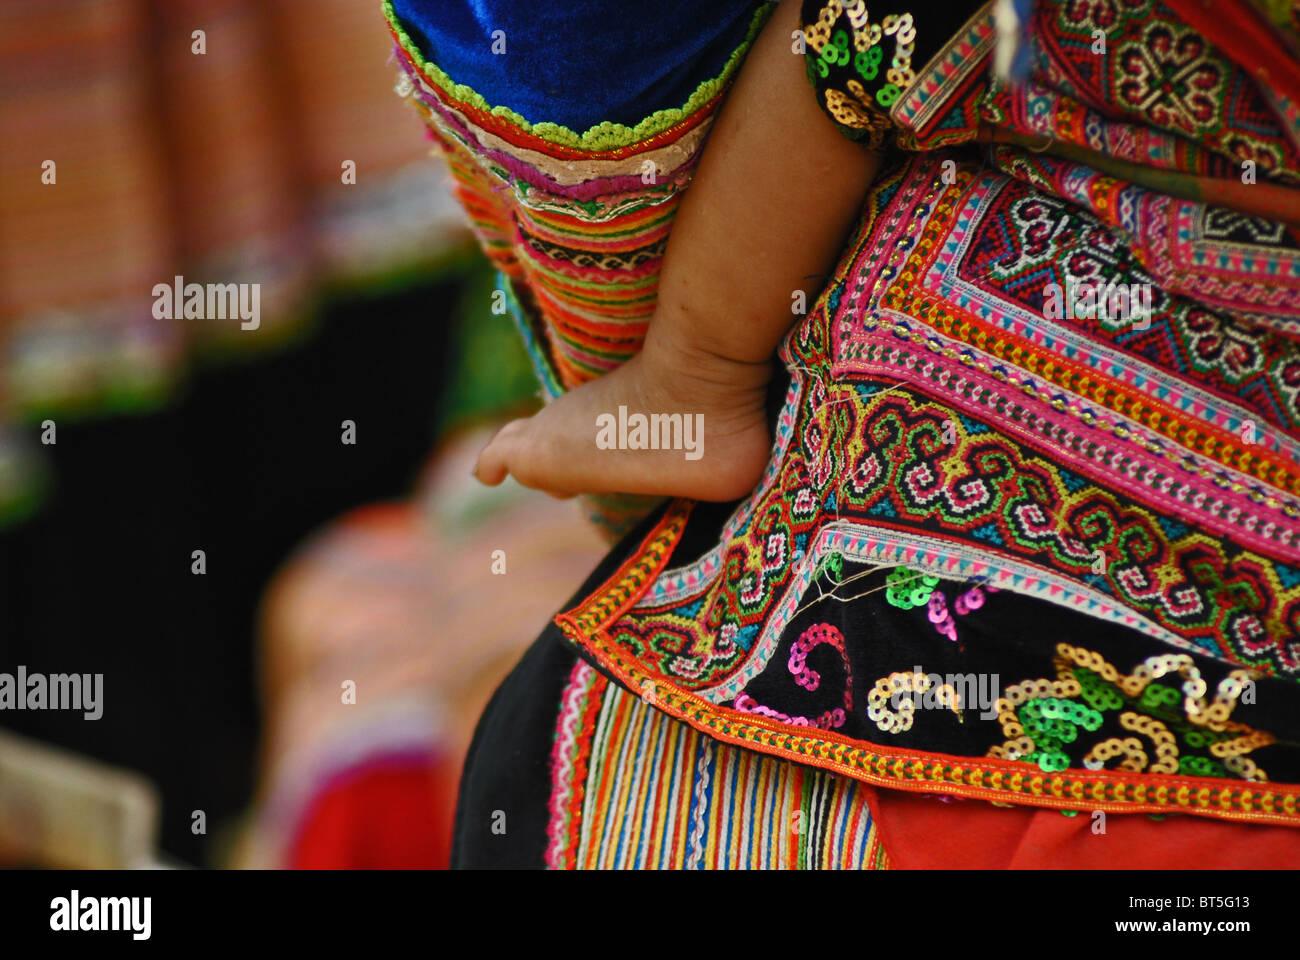 Flower Hmong baby on mother's back near Sapa, Vietnam - Stock Image